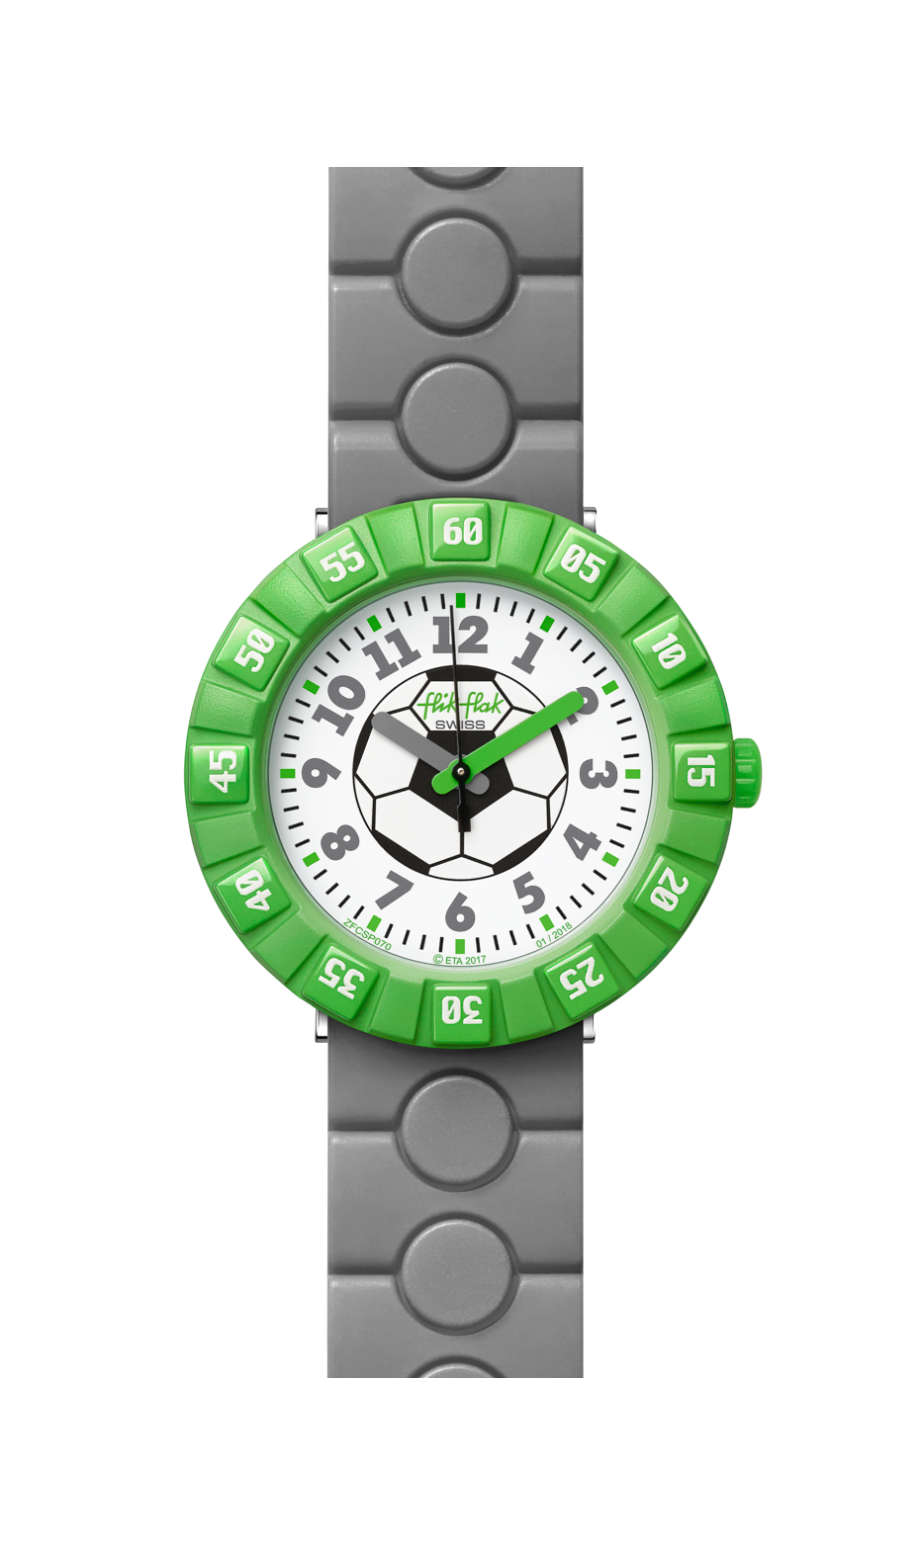 Swatch - HAT-TRICK - 1